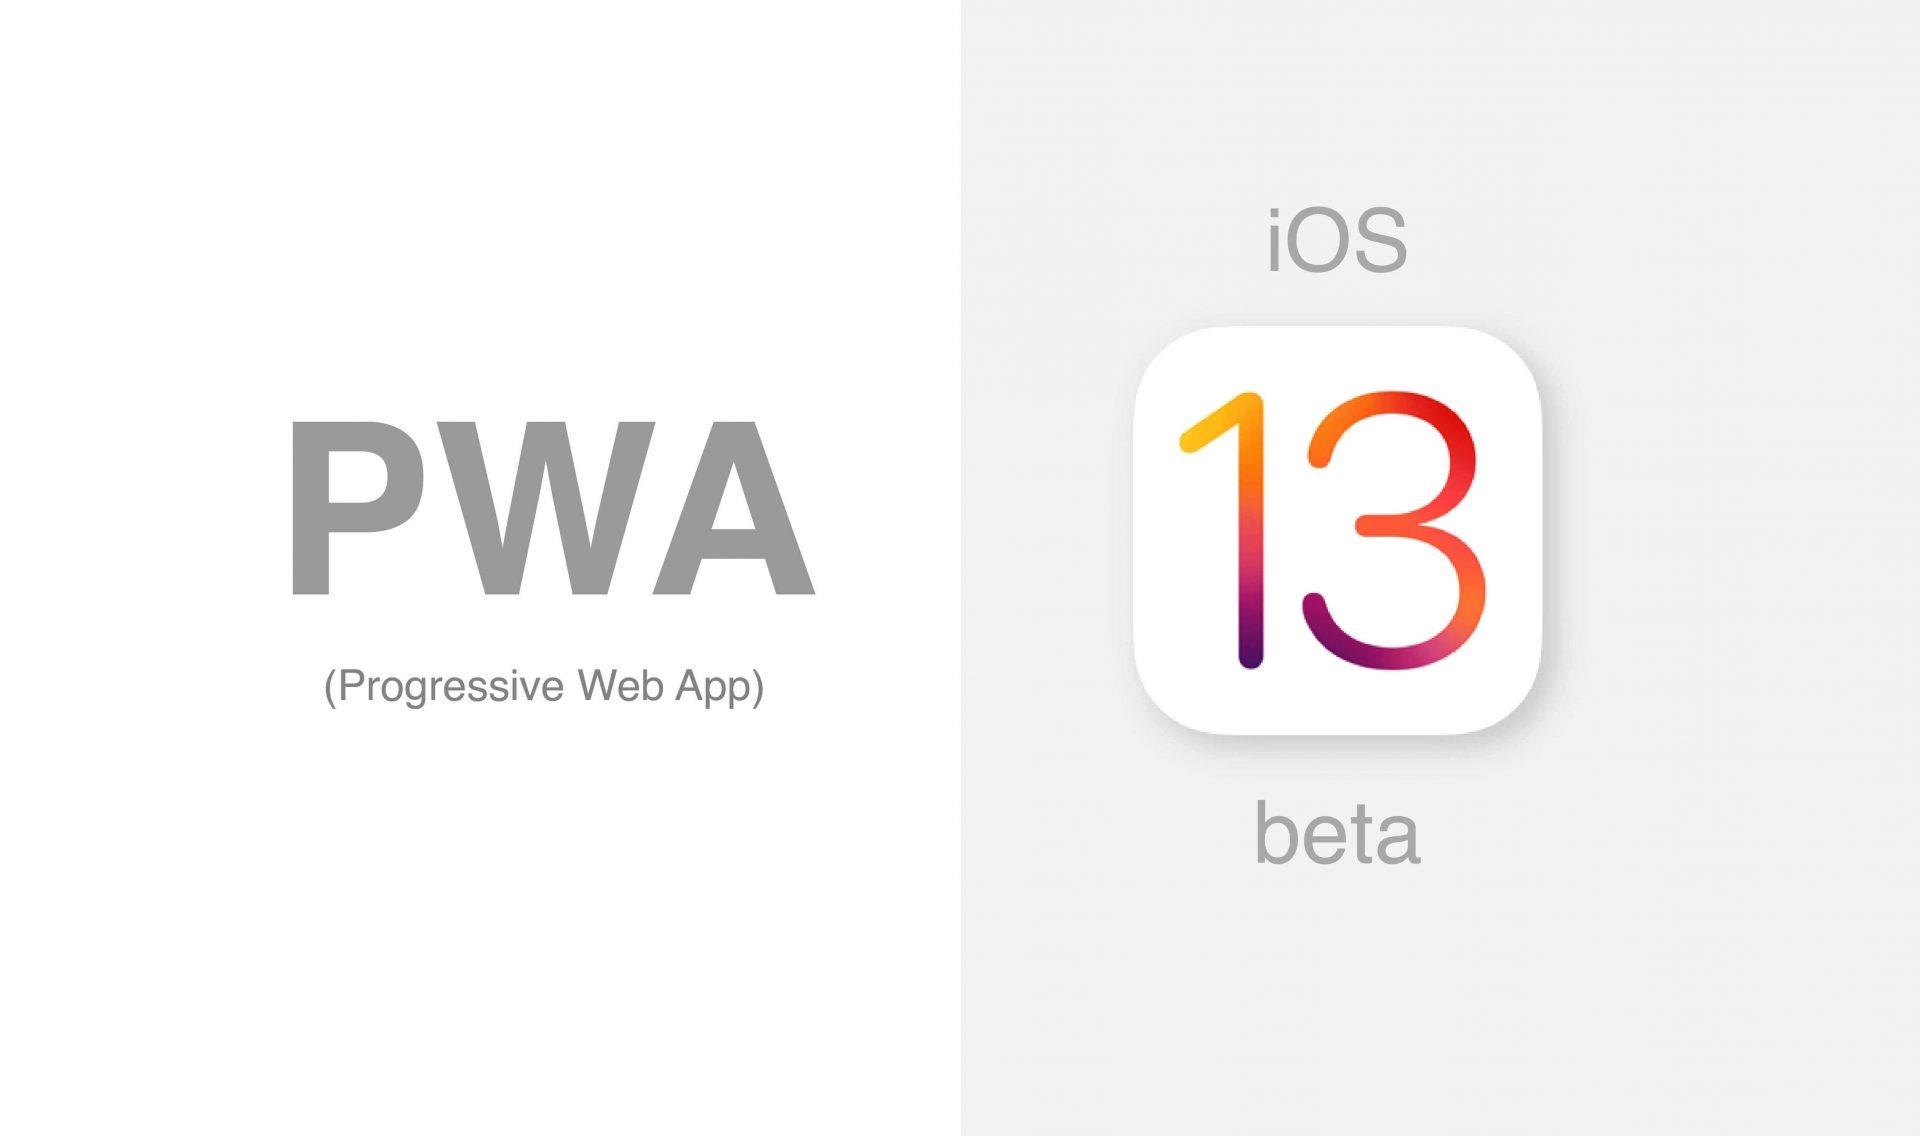 pwa-ios-13-beta